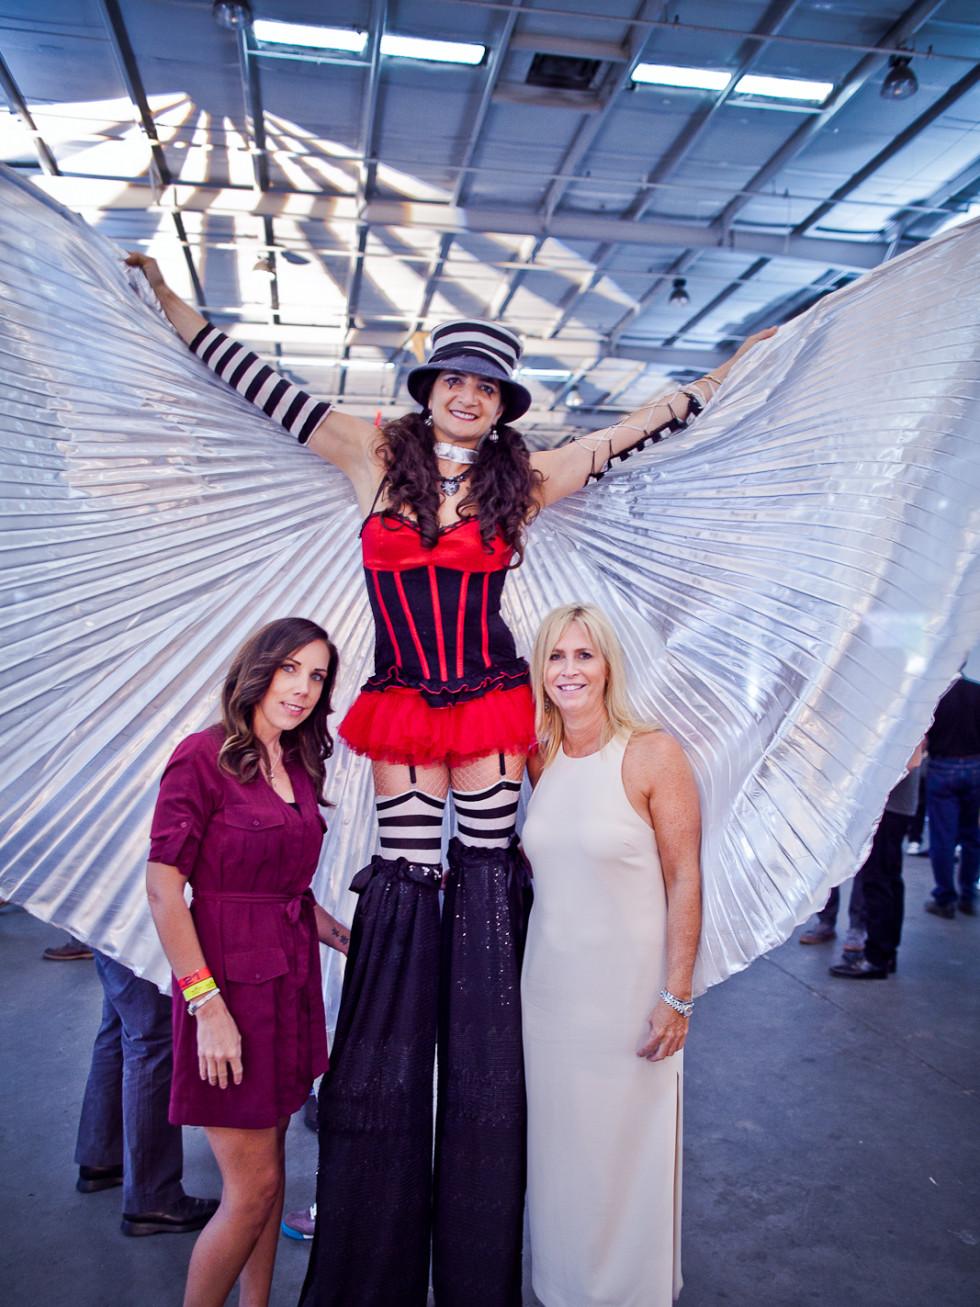 News, Joel, Mini Murals, Sept. 2015, Lisa Appleby, Cirque Noir performer, Lauren Valentino